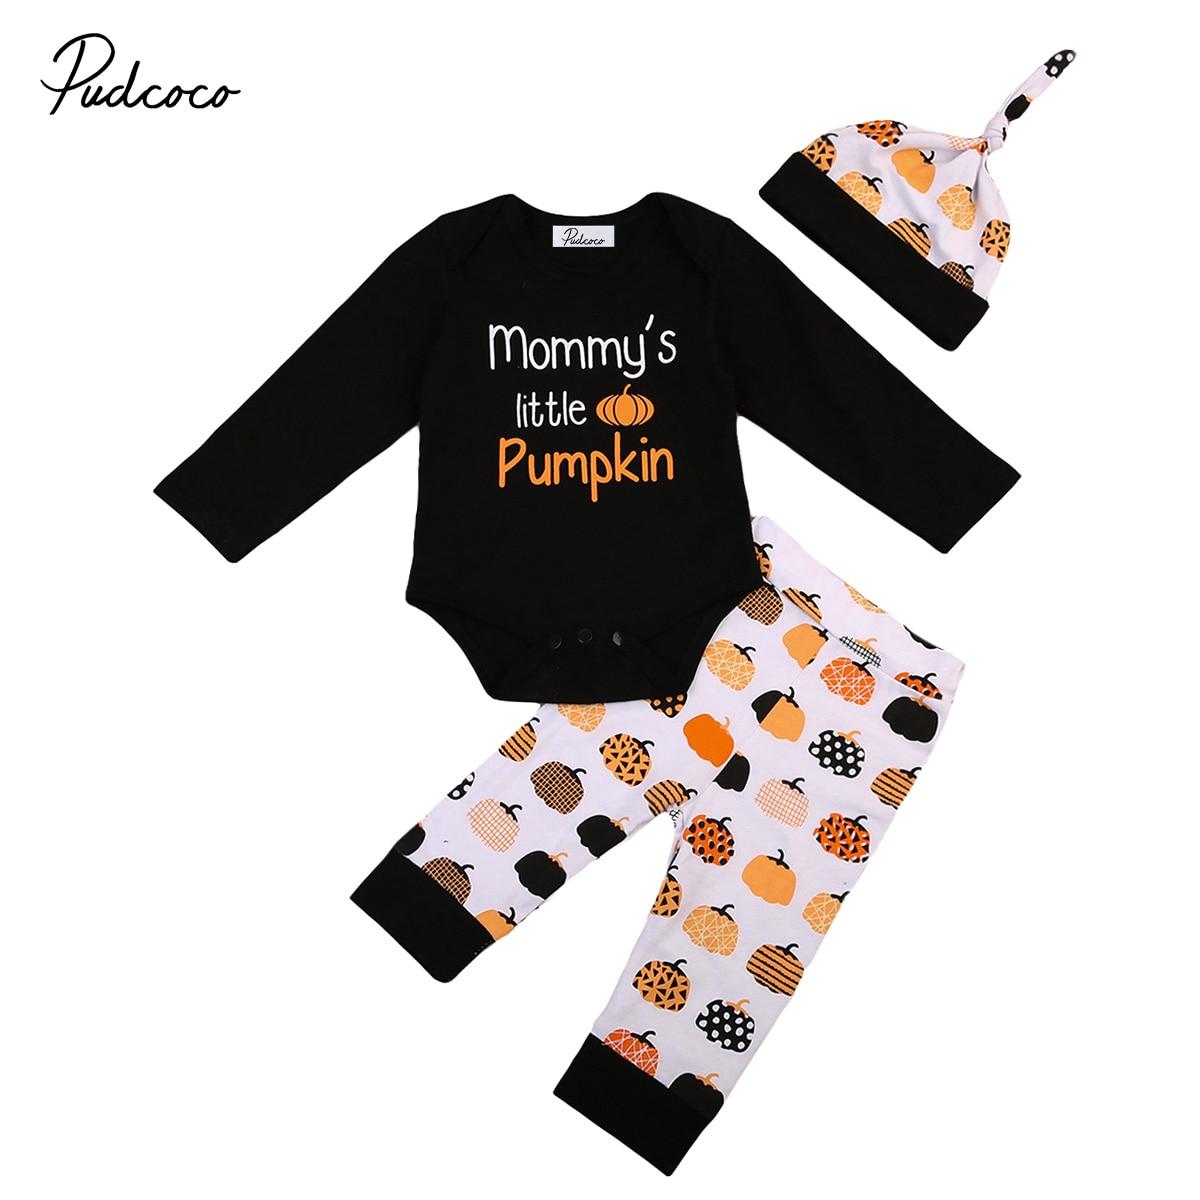 Halloween Newborn Baby Boys Girls Clothes Set Cotton Romper Tops Pants Leggings Hats Pumpkin Outfits